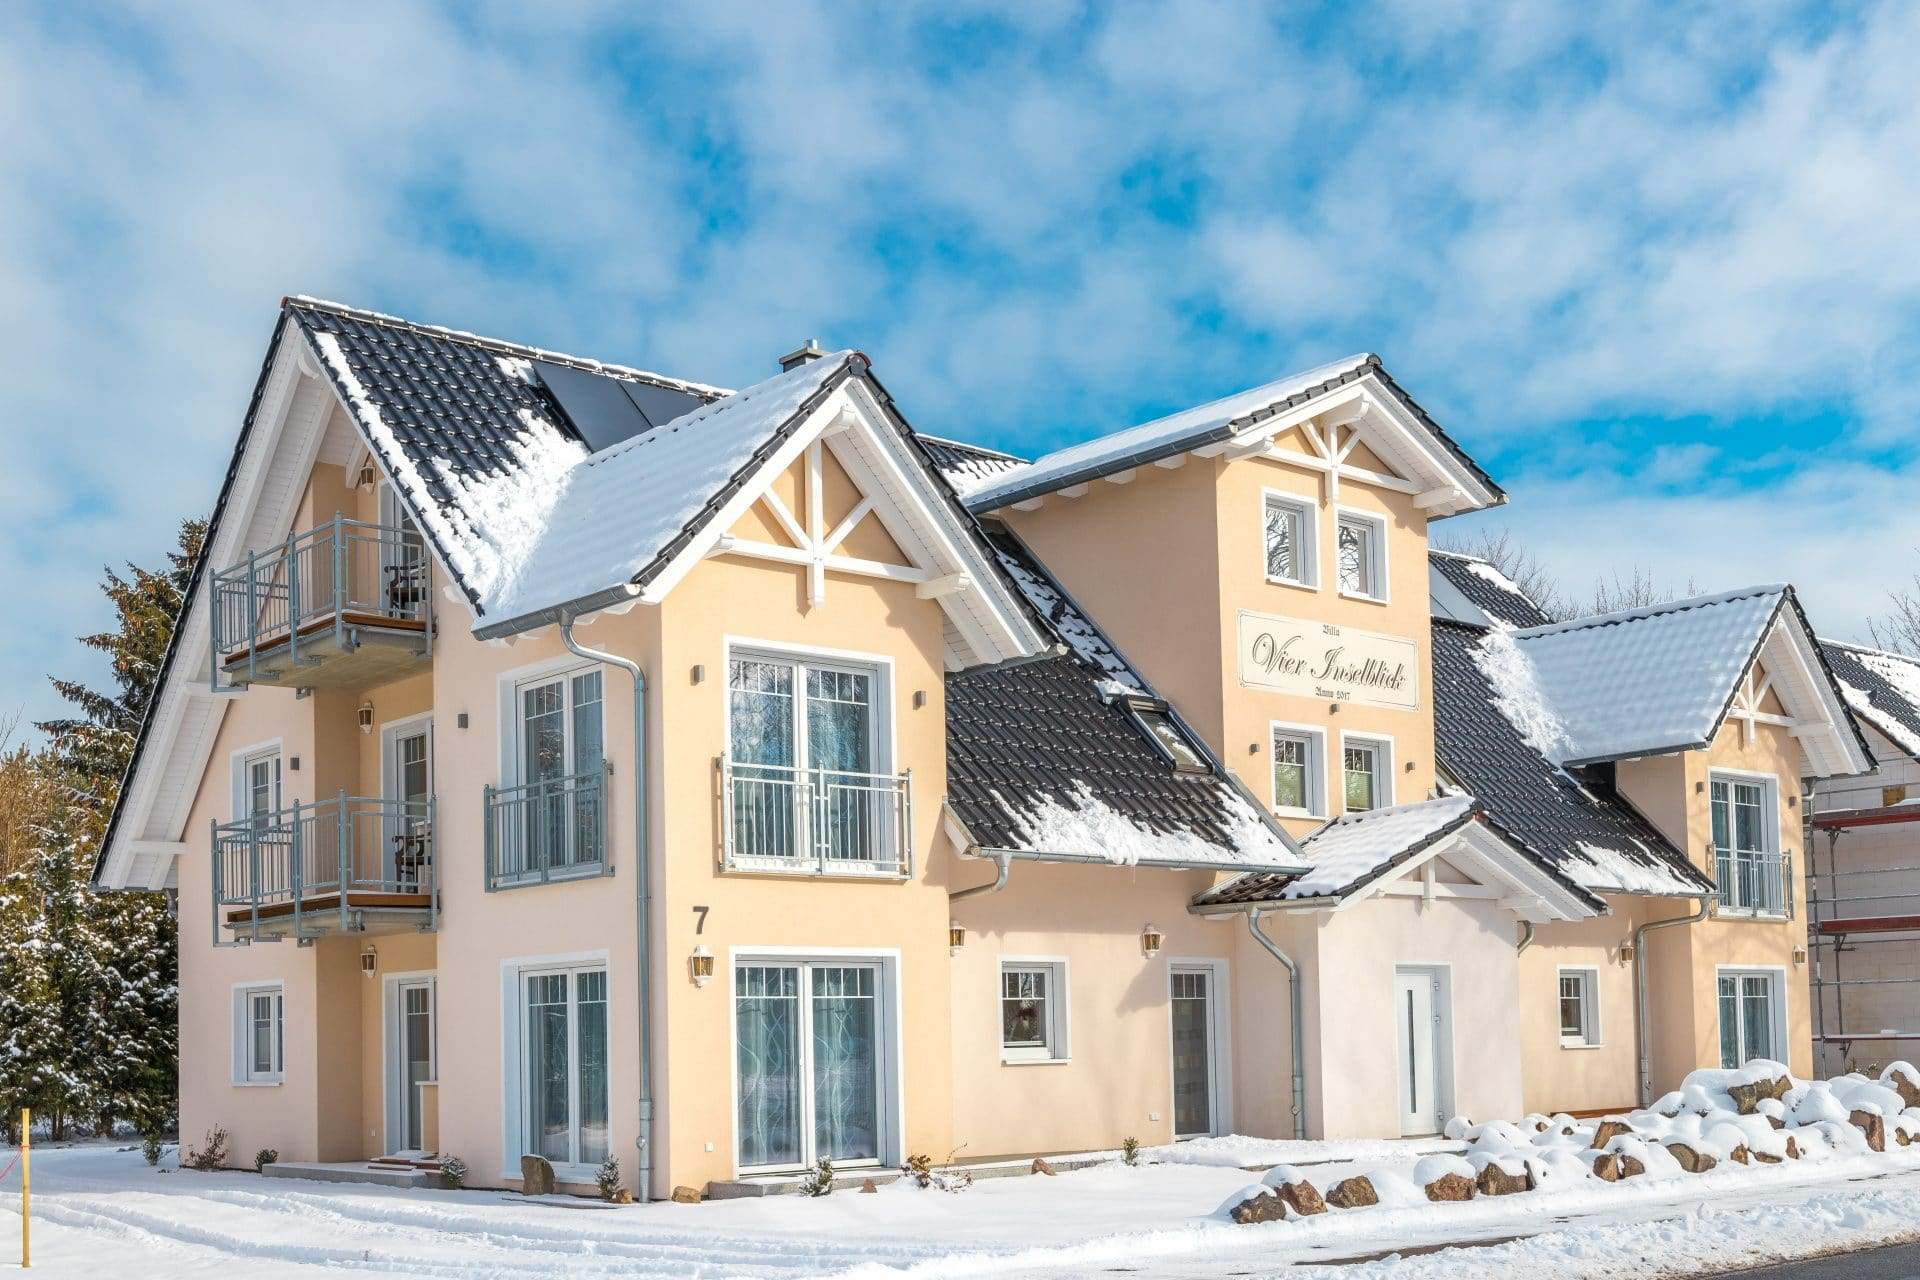 Ferienhaus Villa Vier Inselblick im Winter